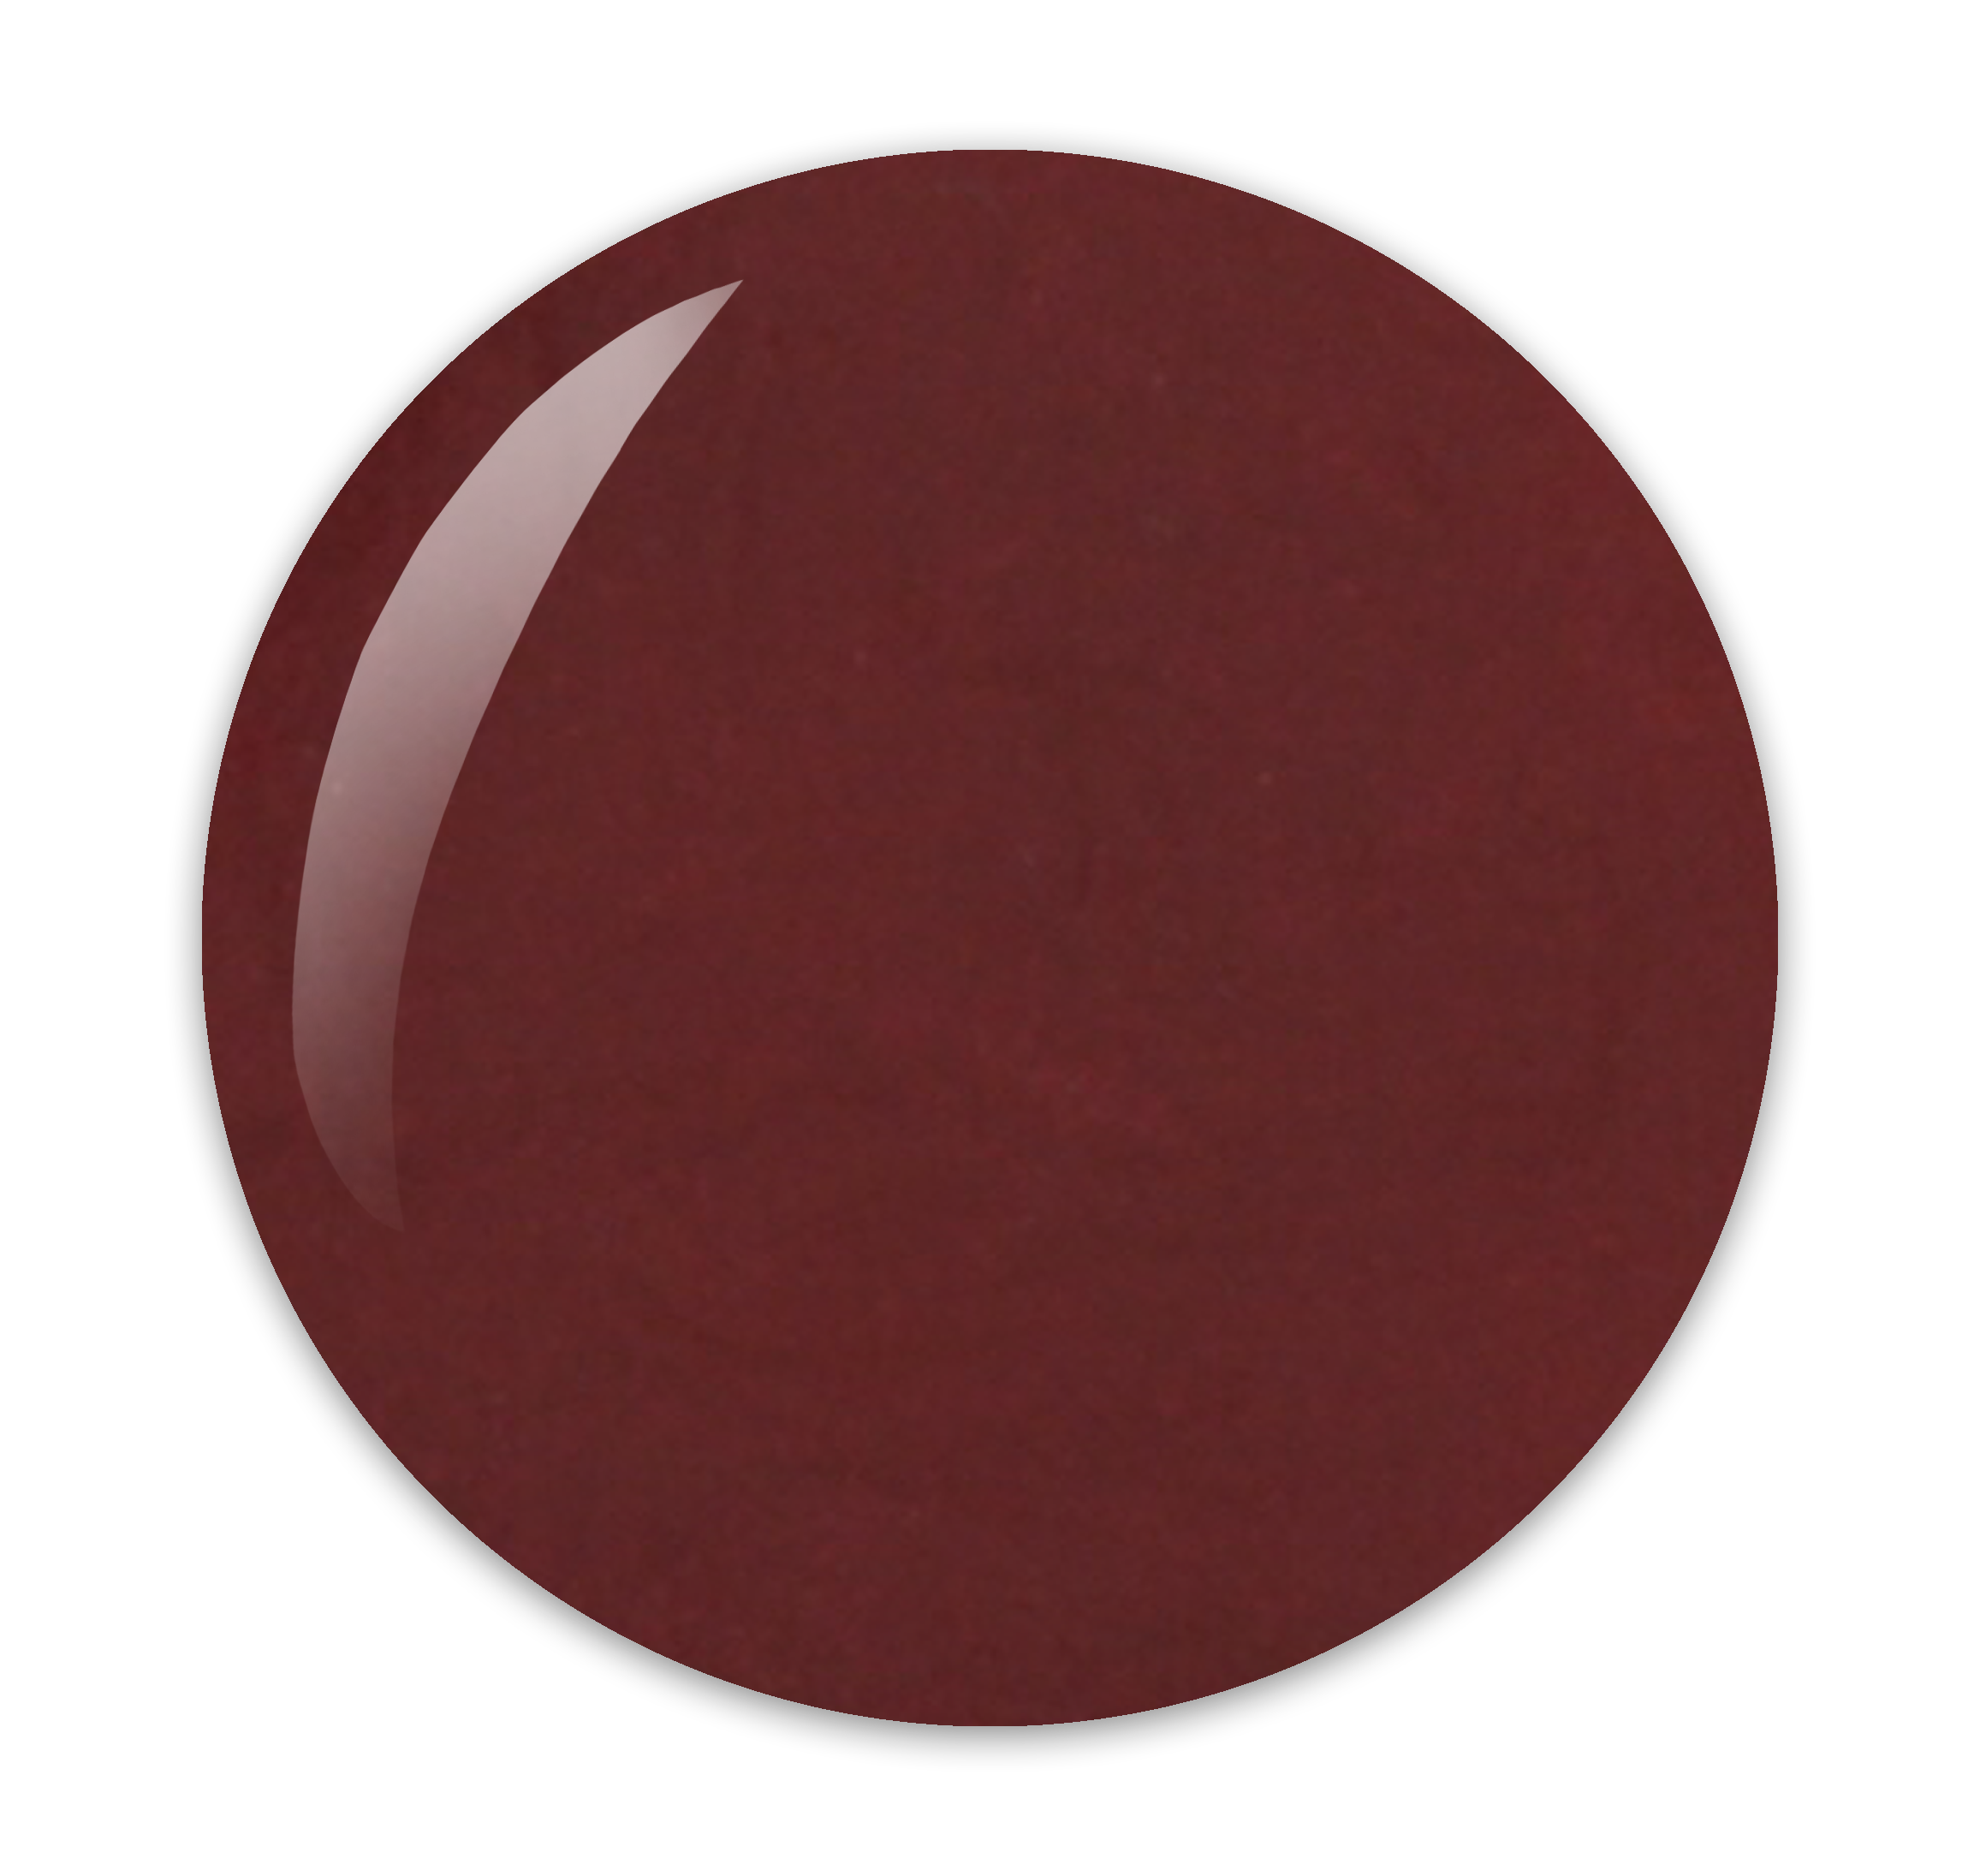 Herôme donker rode nagellak kleur